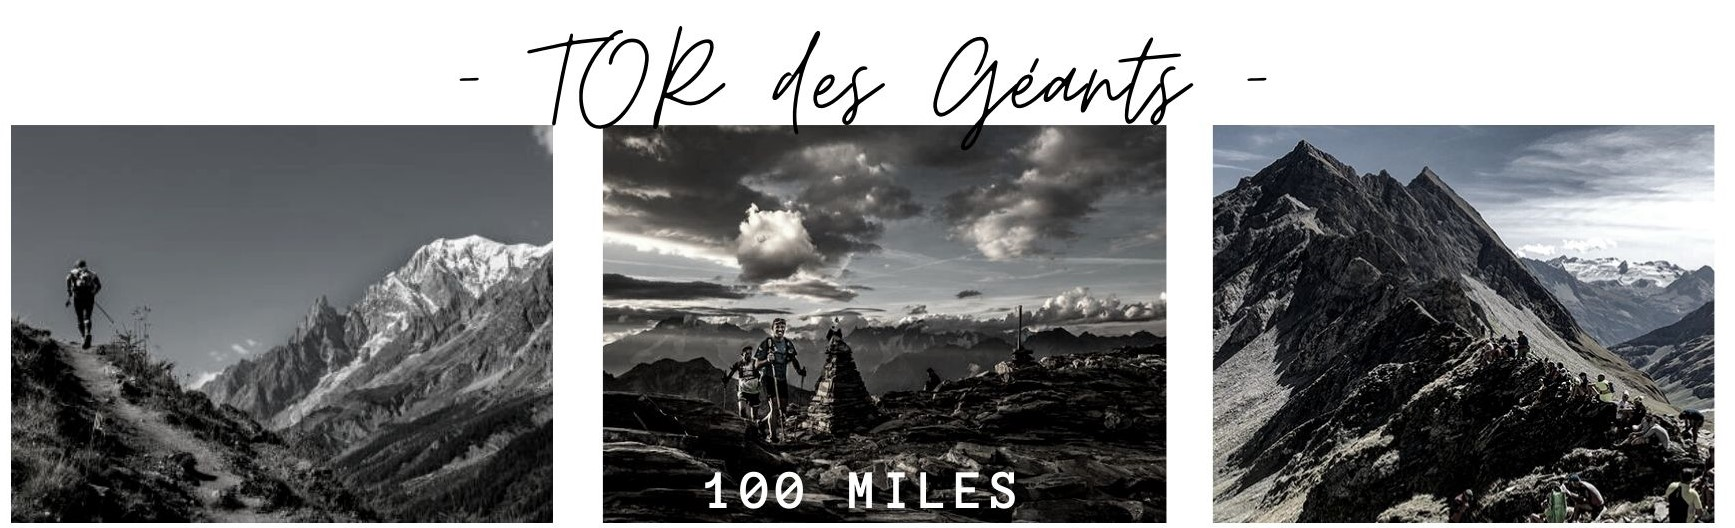 TOR des géants trail running